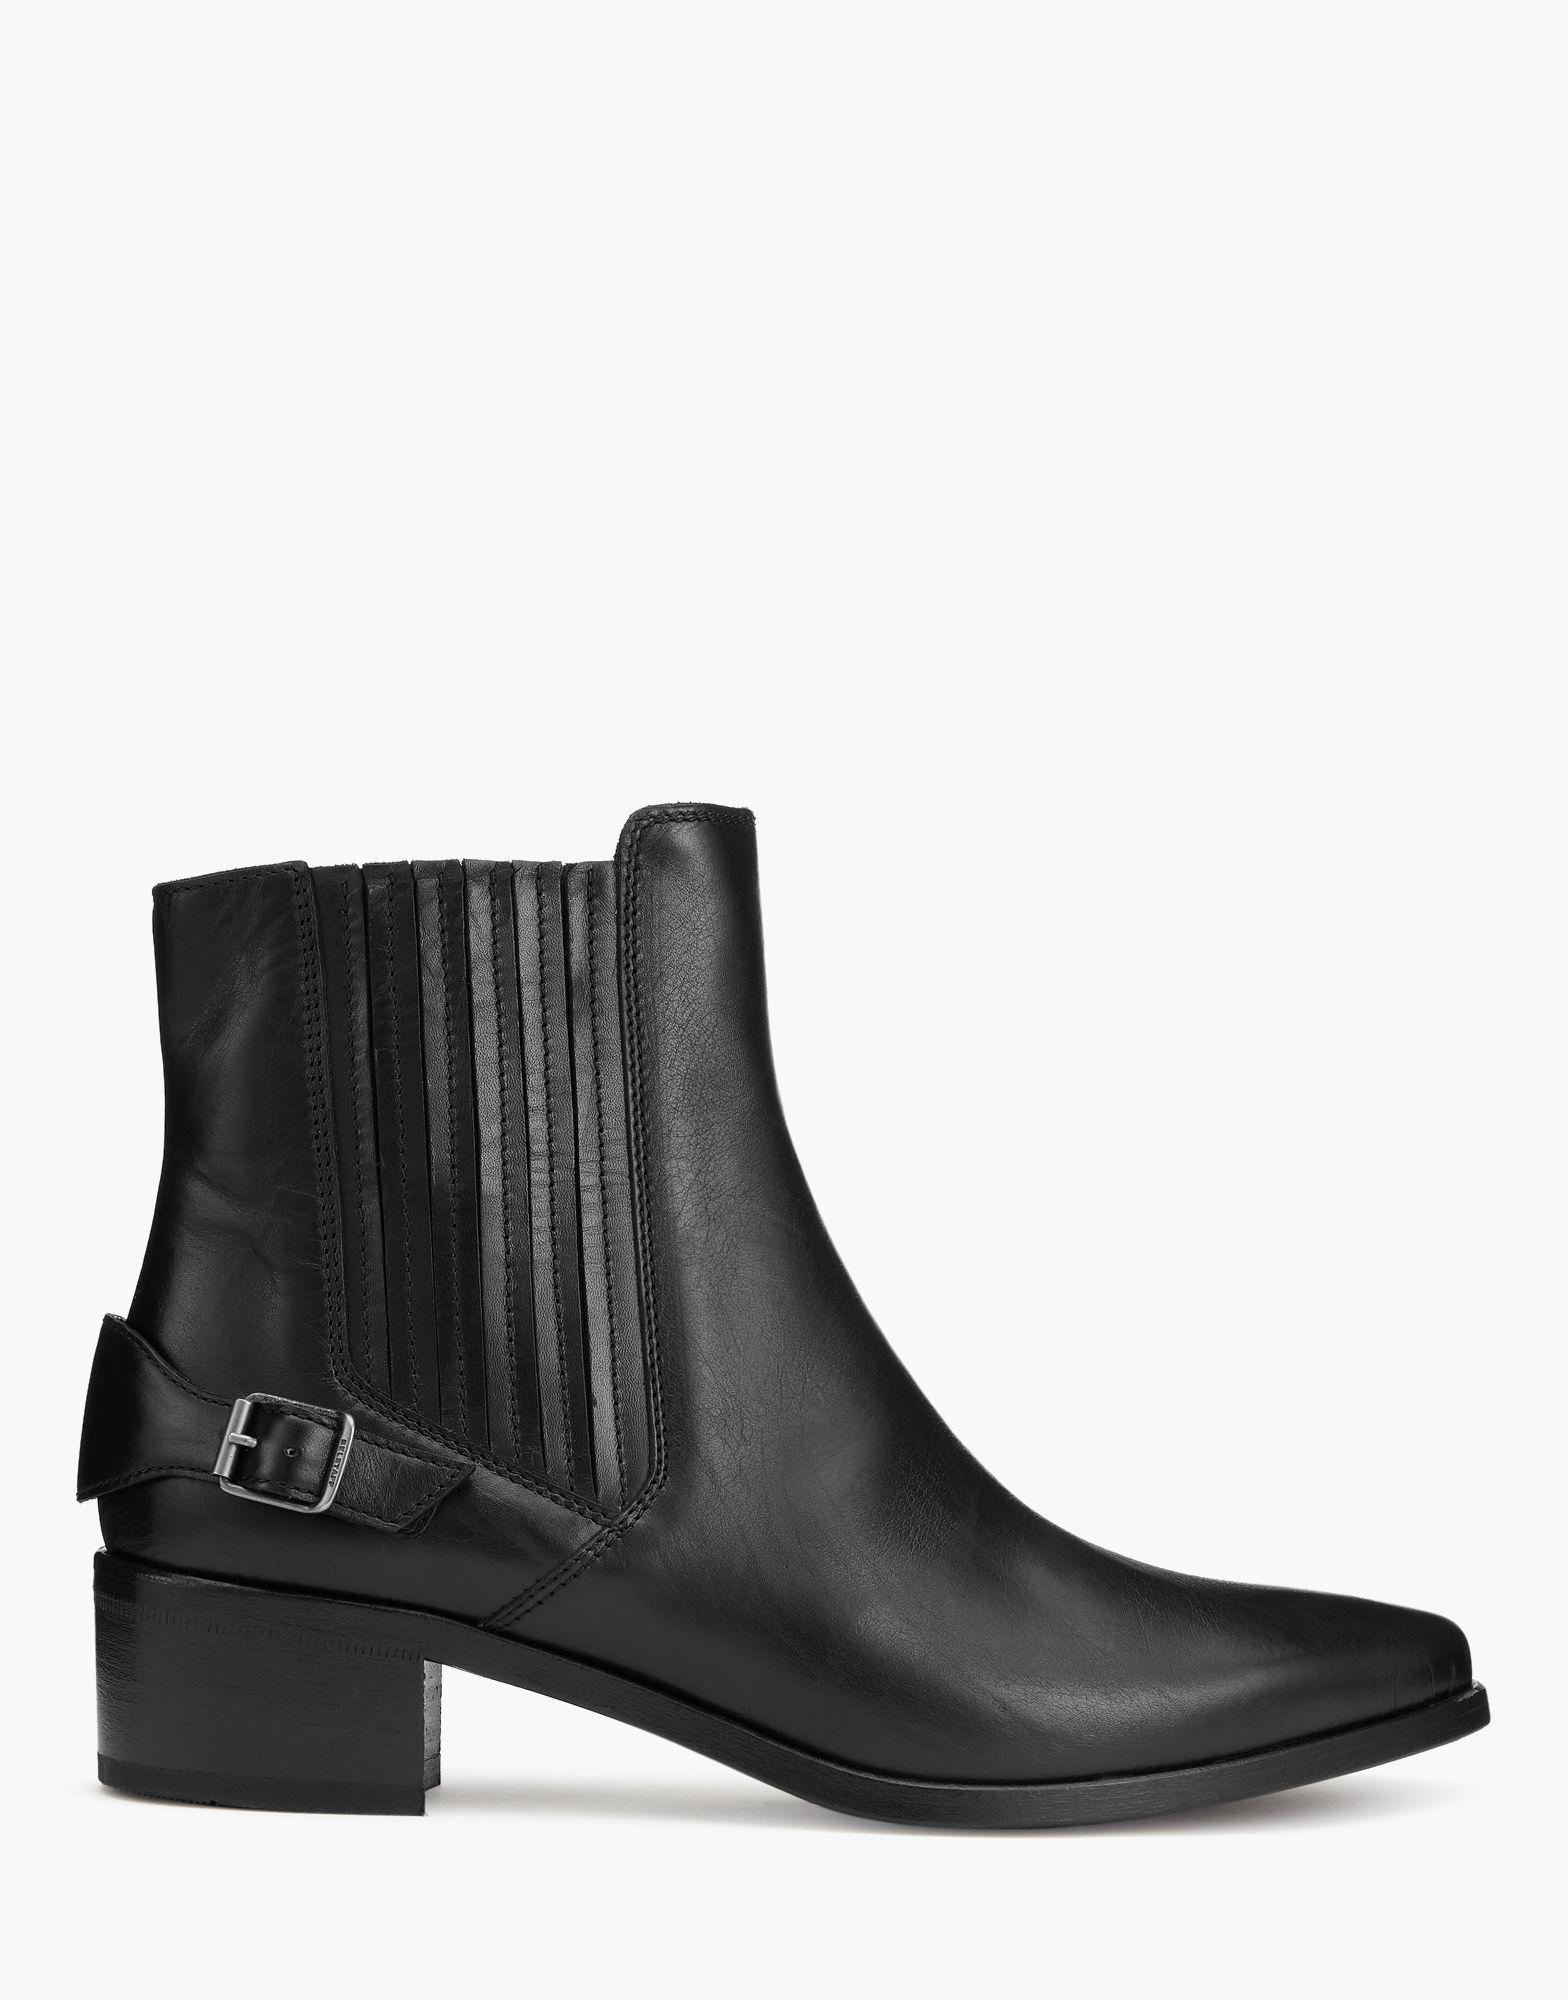 Belstaff Blaydon Boots Black Belstaff maVIHa6X